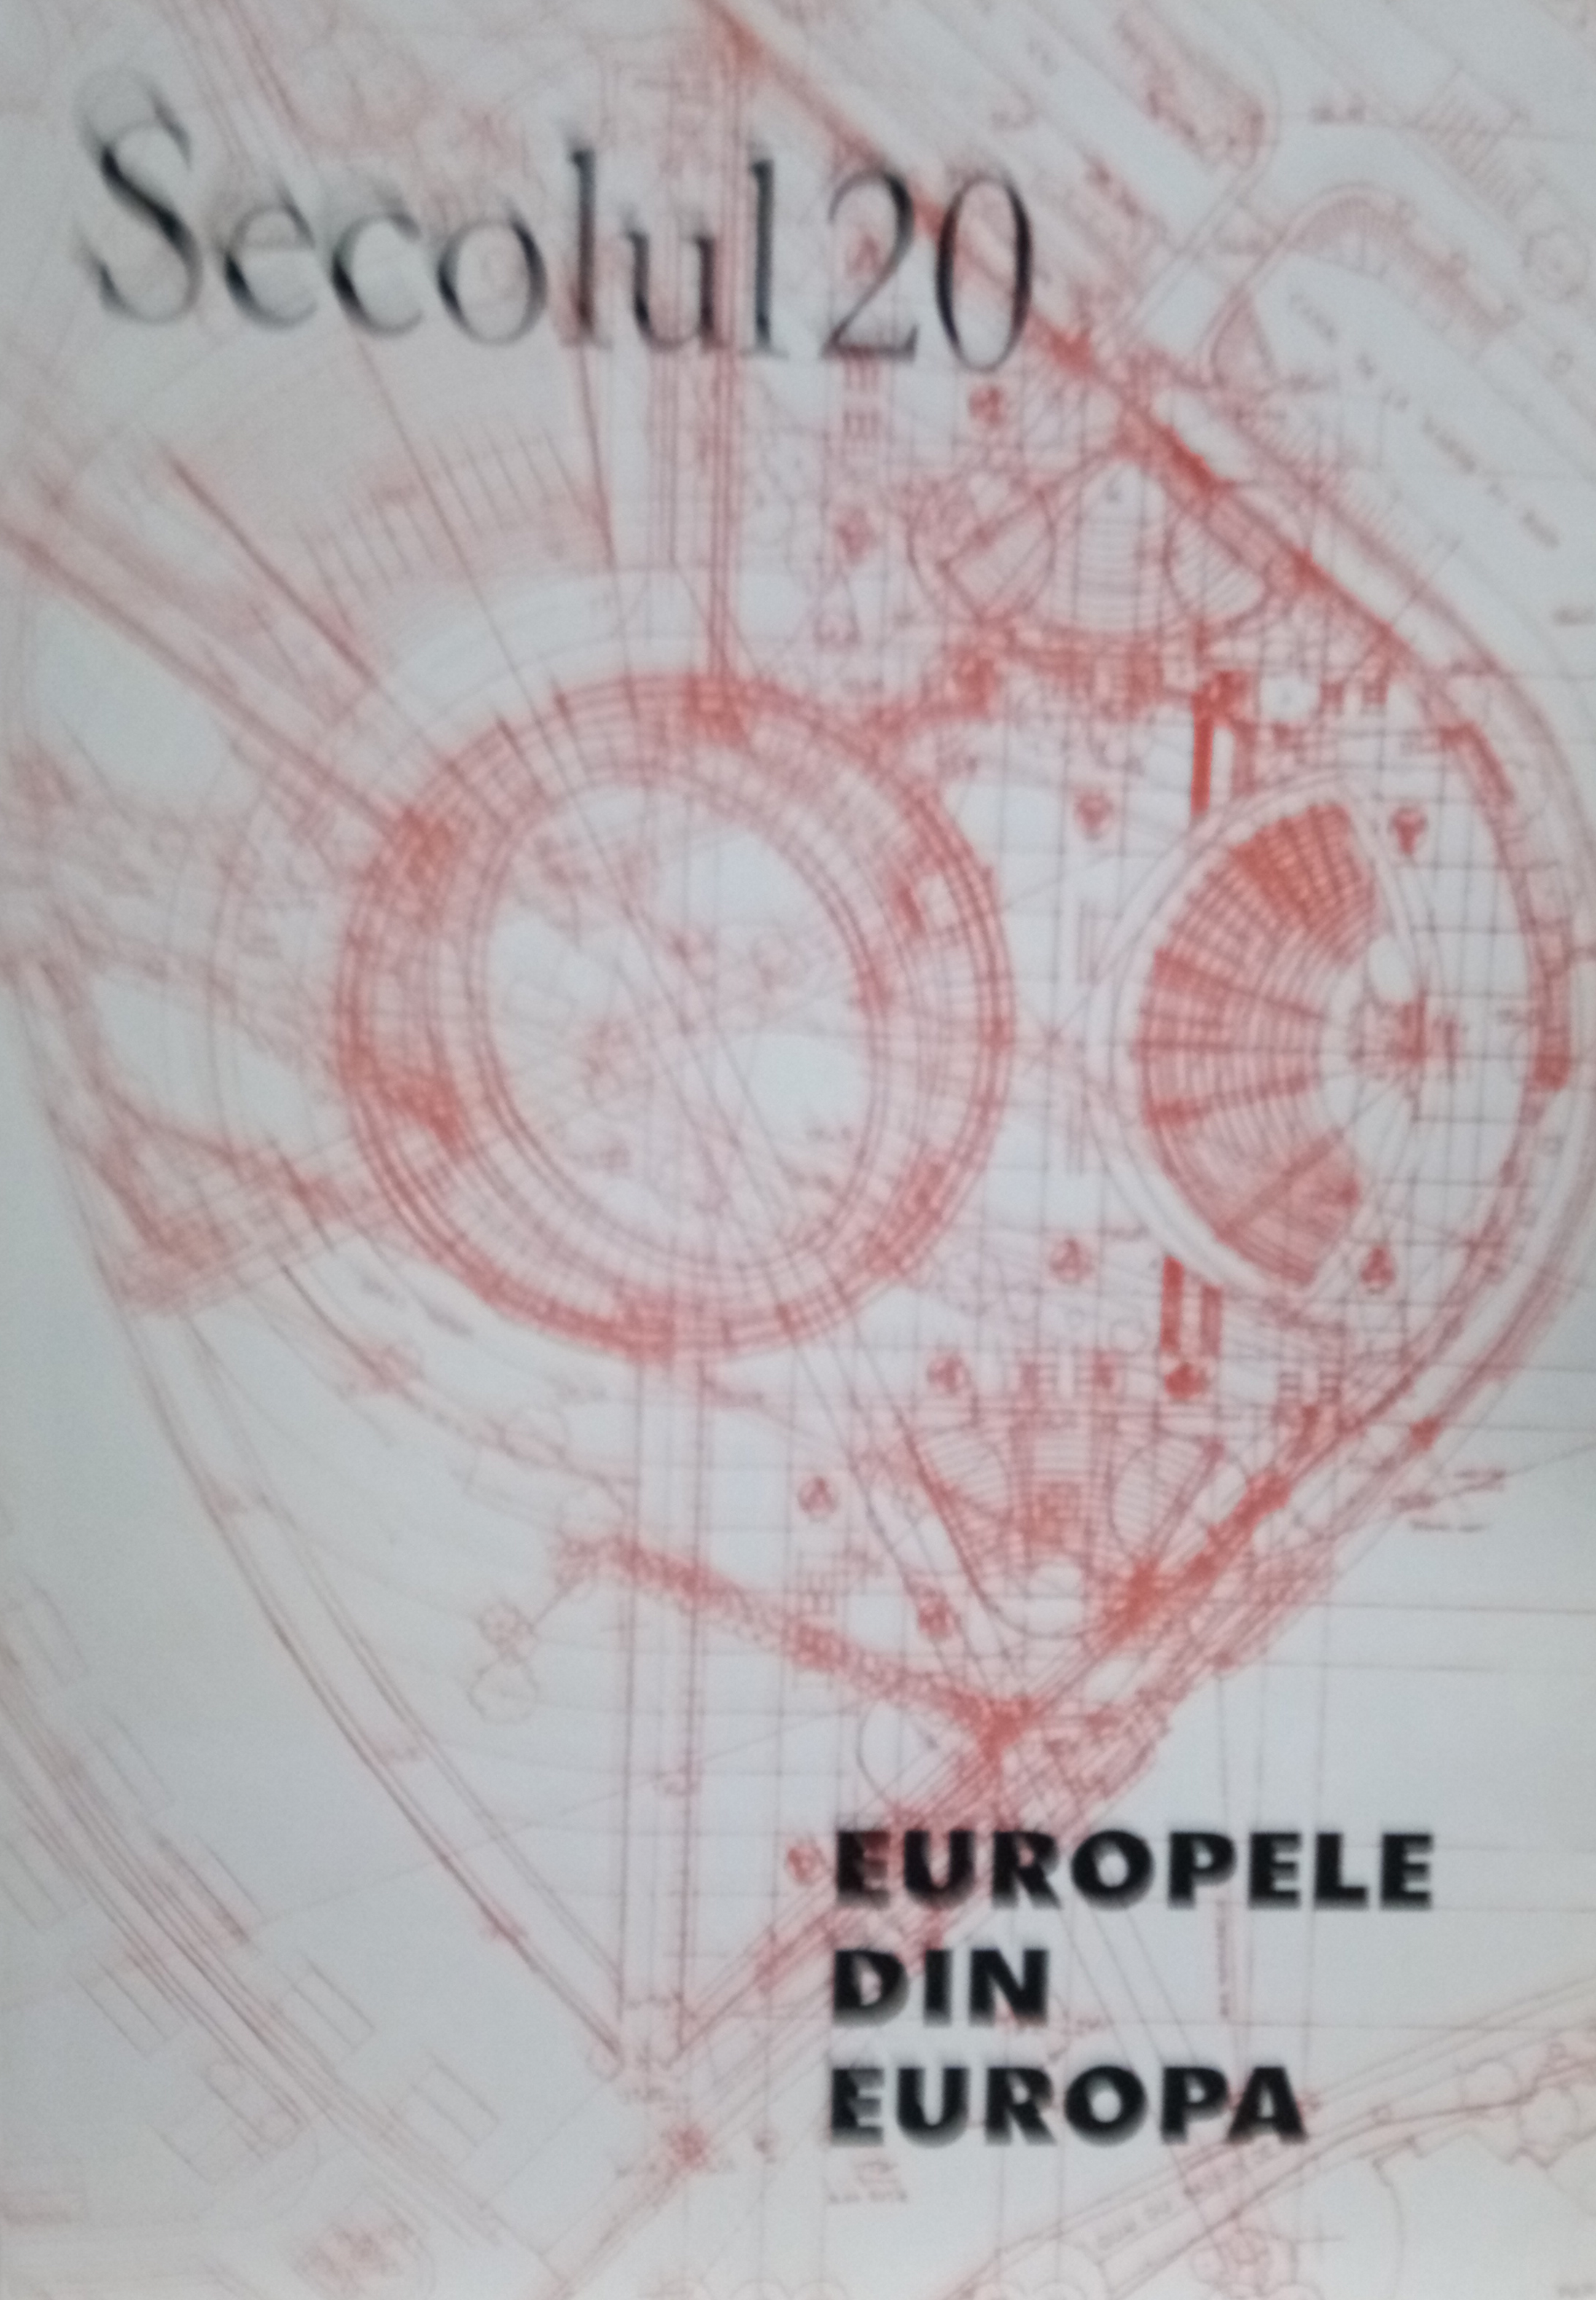 Secolul 20 - Europele din Europa